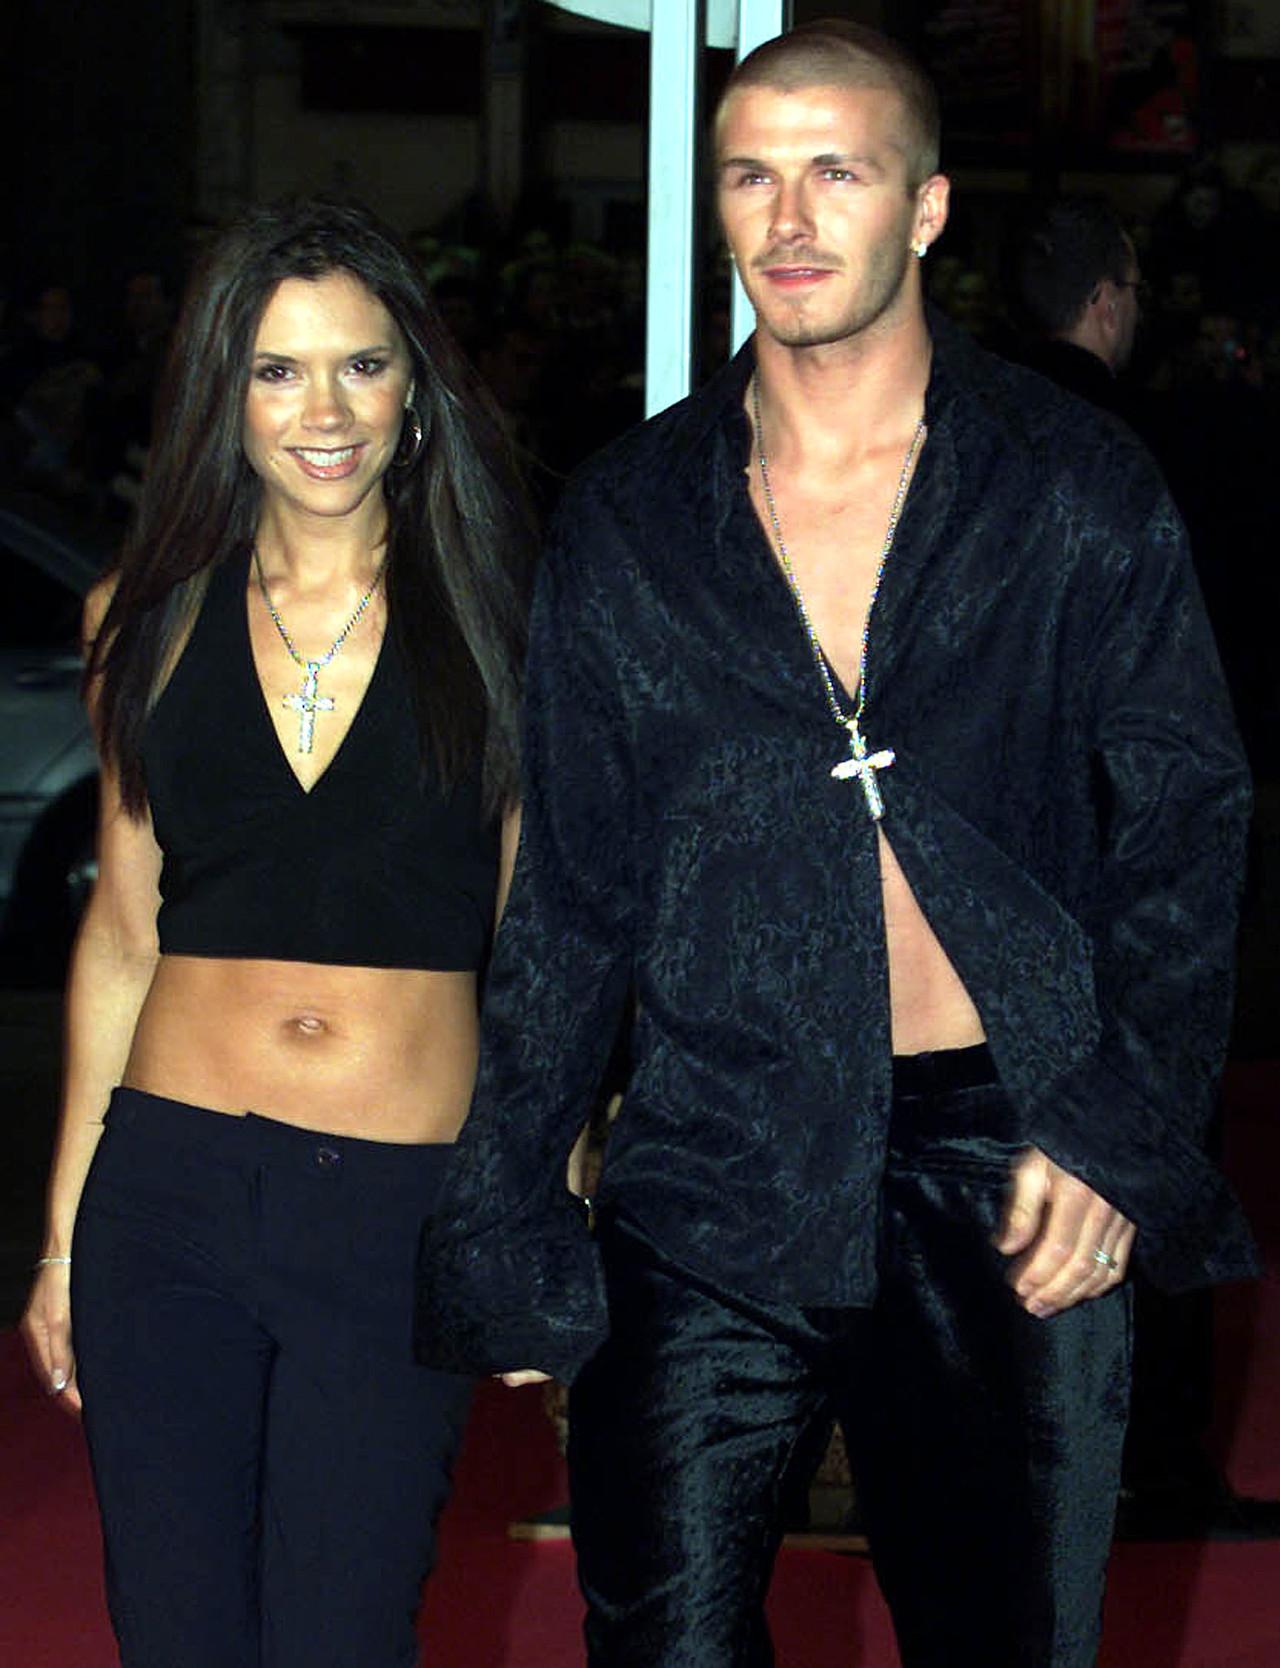 Victoria Beckham i David Beckham na początku związku.